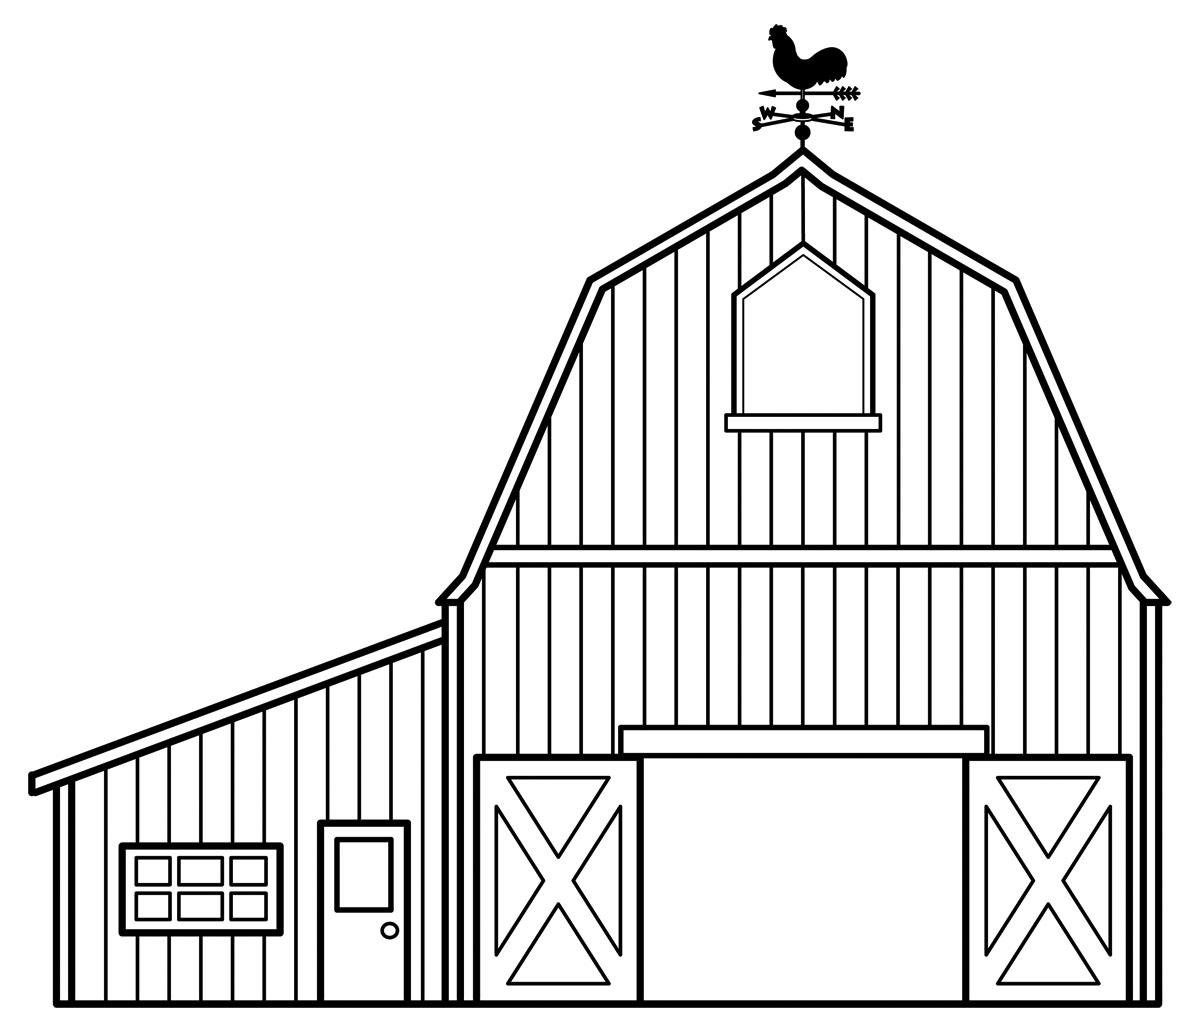 Barn black and white. Farmhouse clipart outline